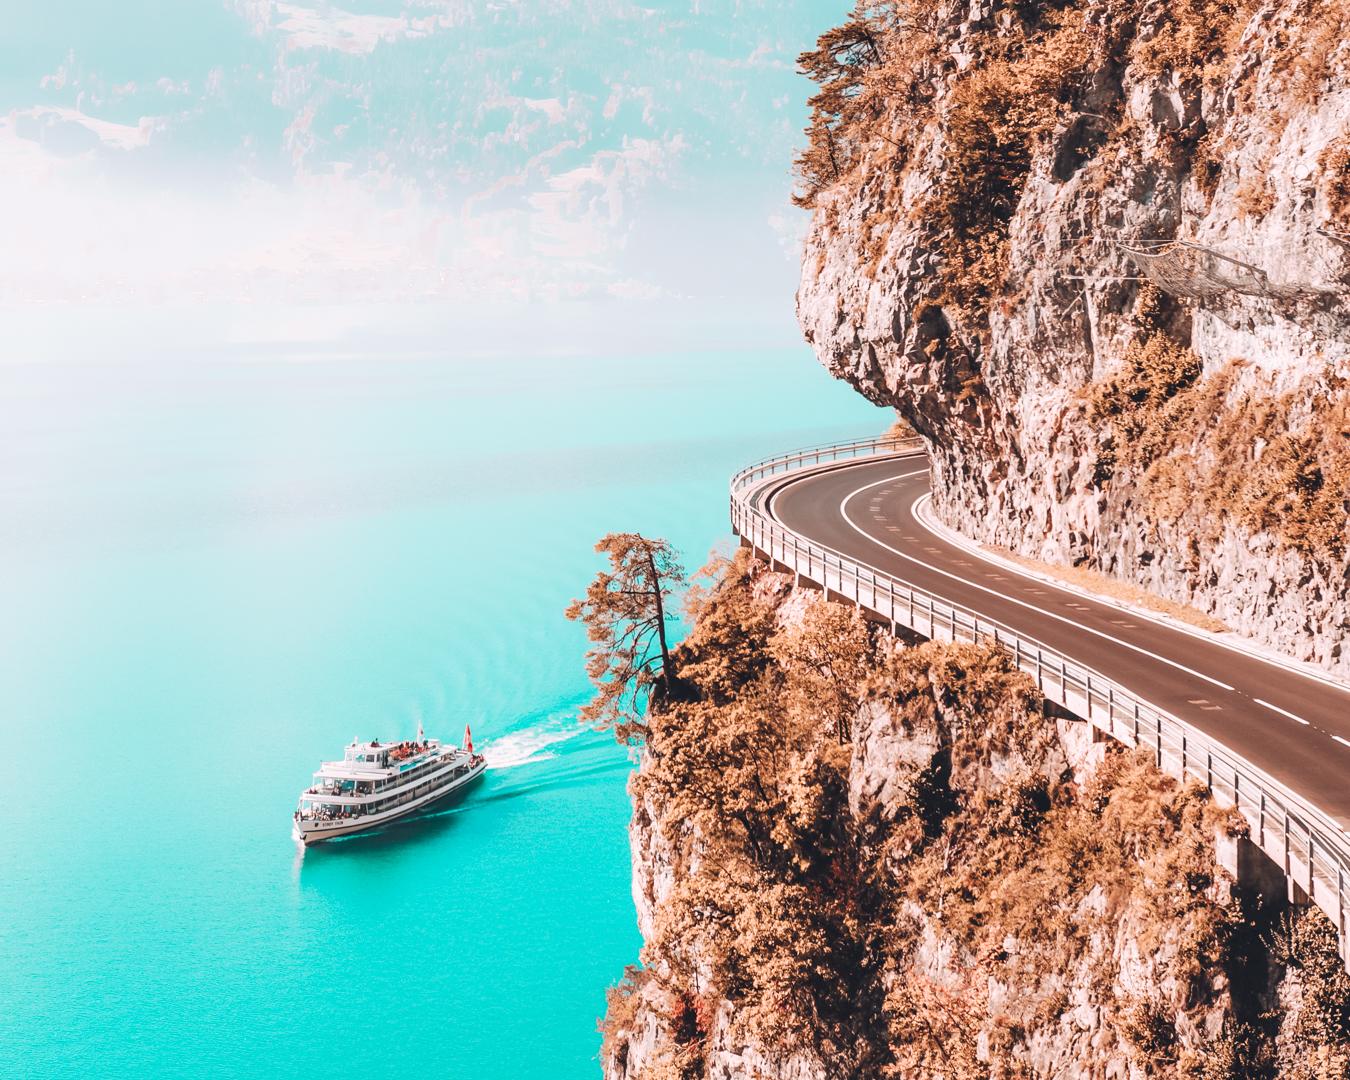 A beautiful road at Lake Thun in Switzerland